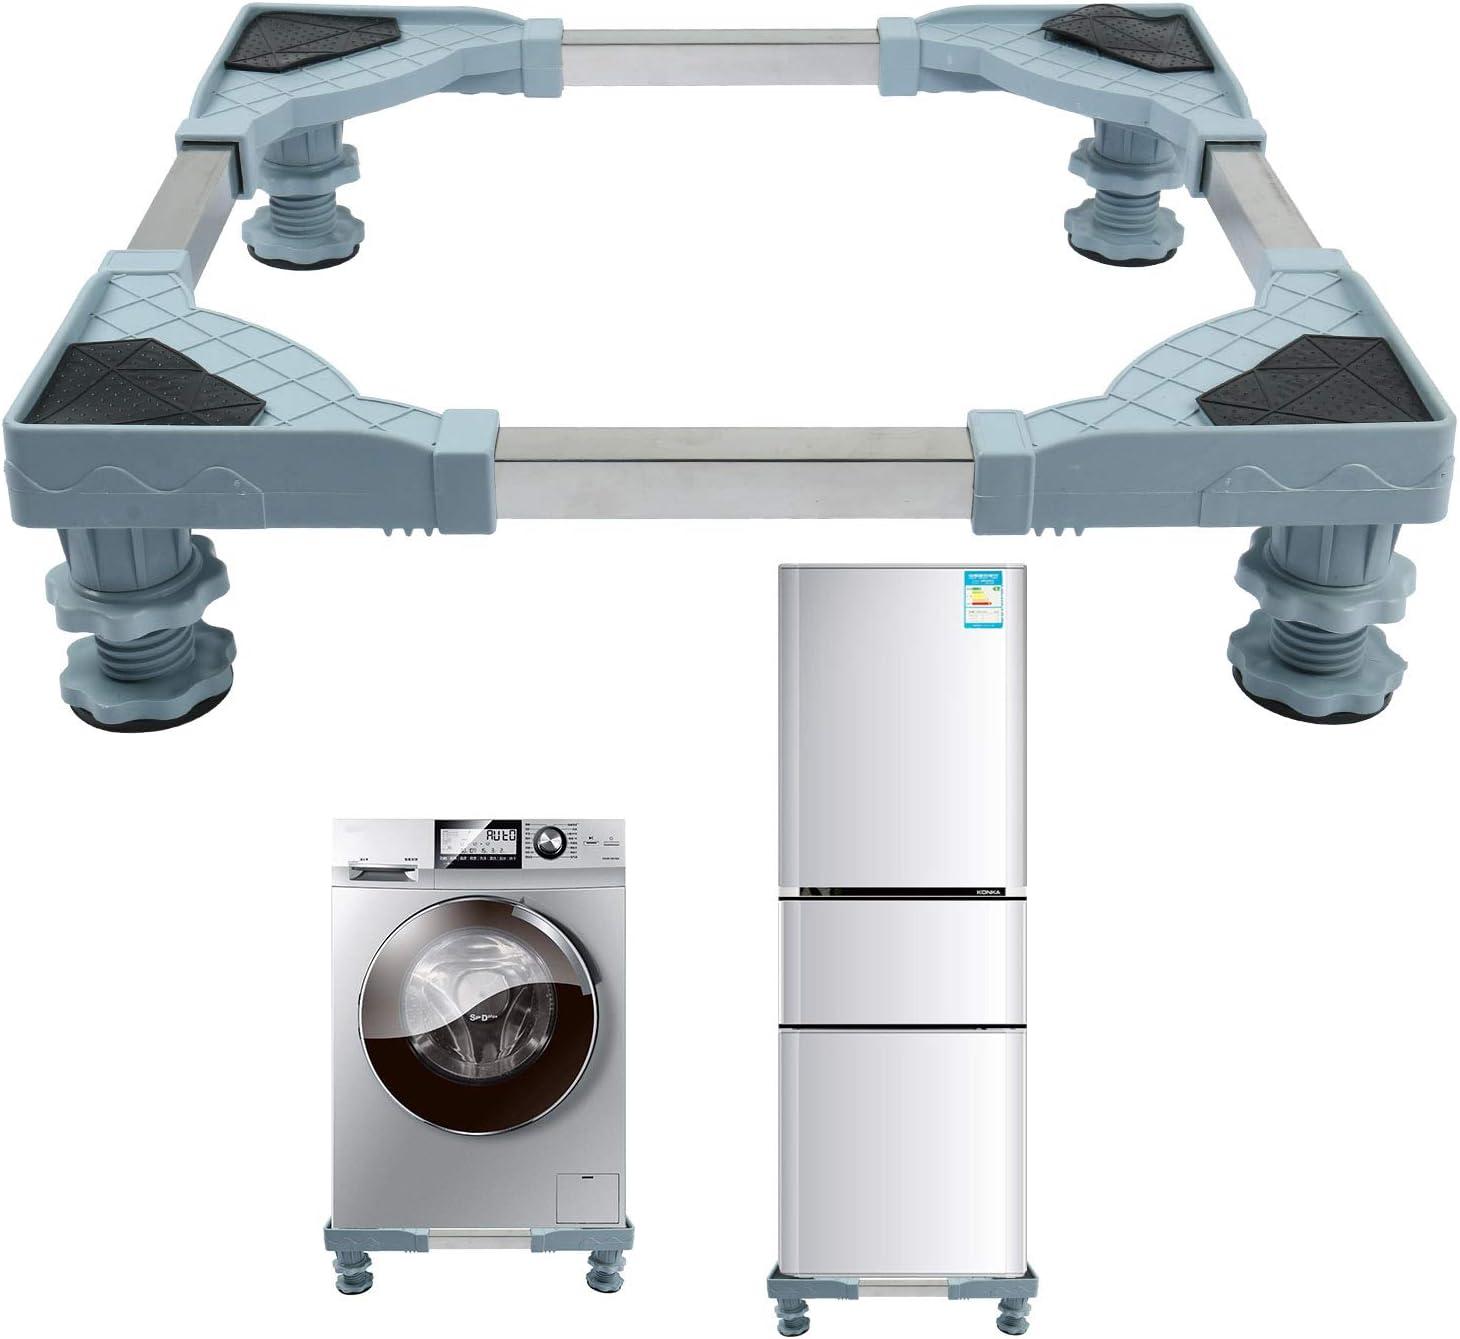 Washing Machine Base, Multi-Functional Heavy Duty 4 Feet Adjustable Base for Refrigerator and Dryer